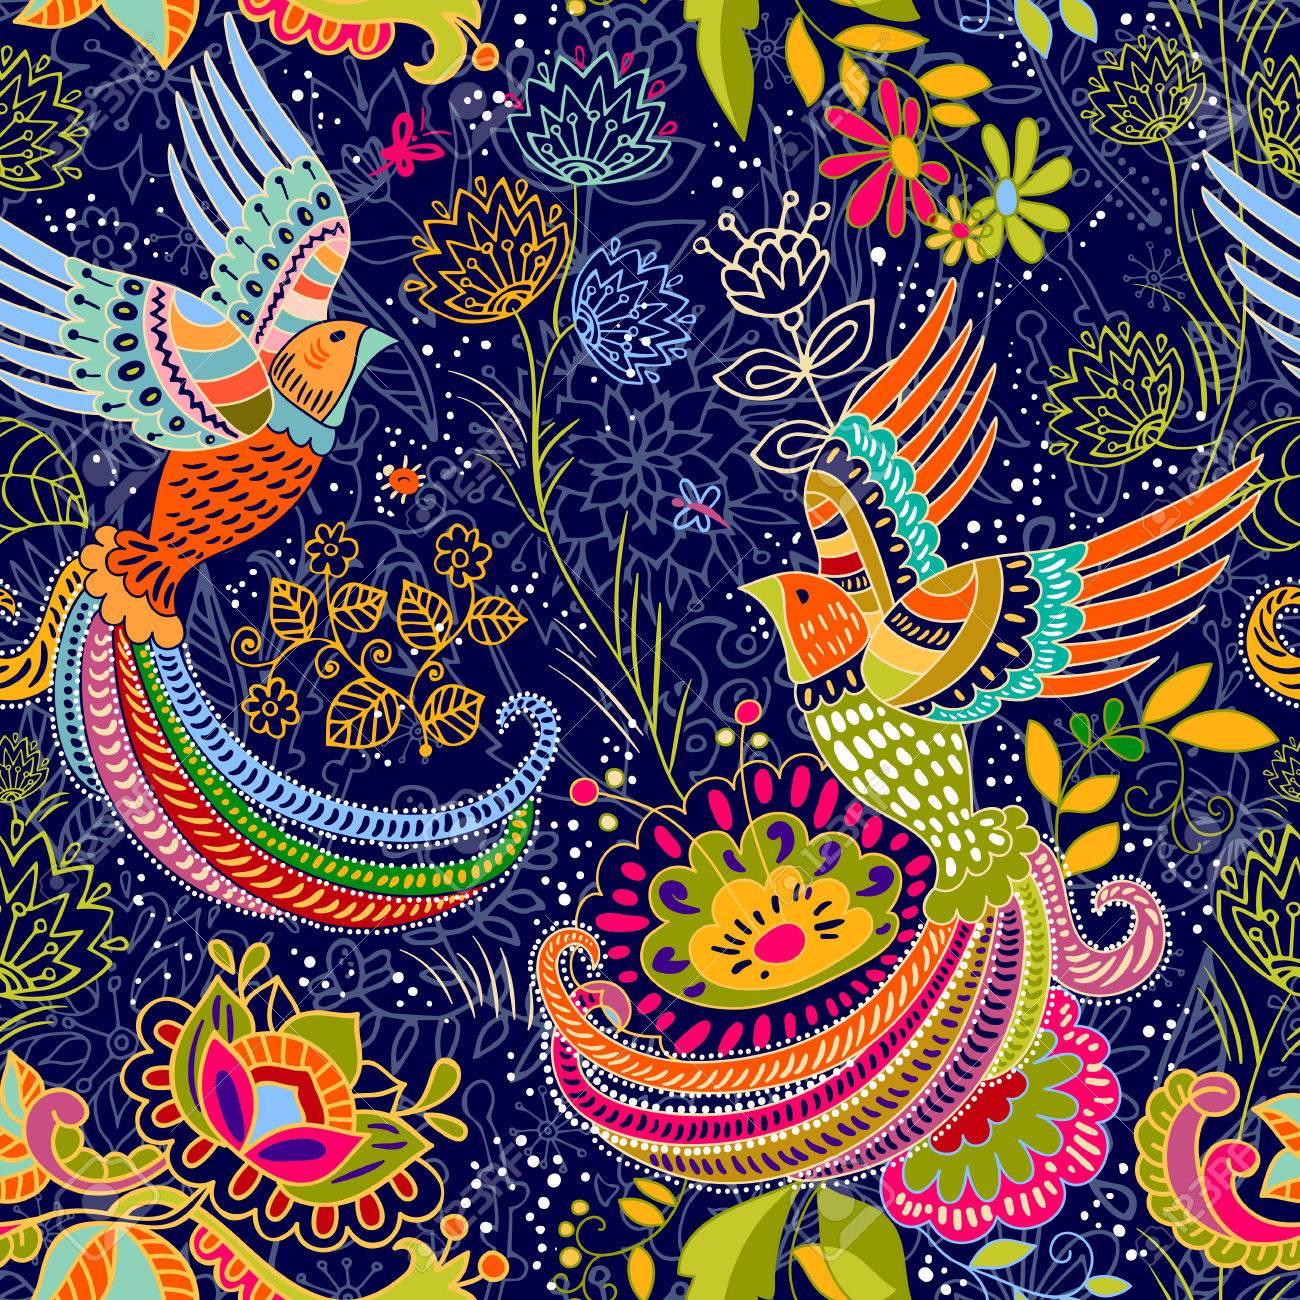 seamless pattern. cartoon style. Colorful backdrop - 60560159